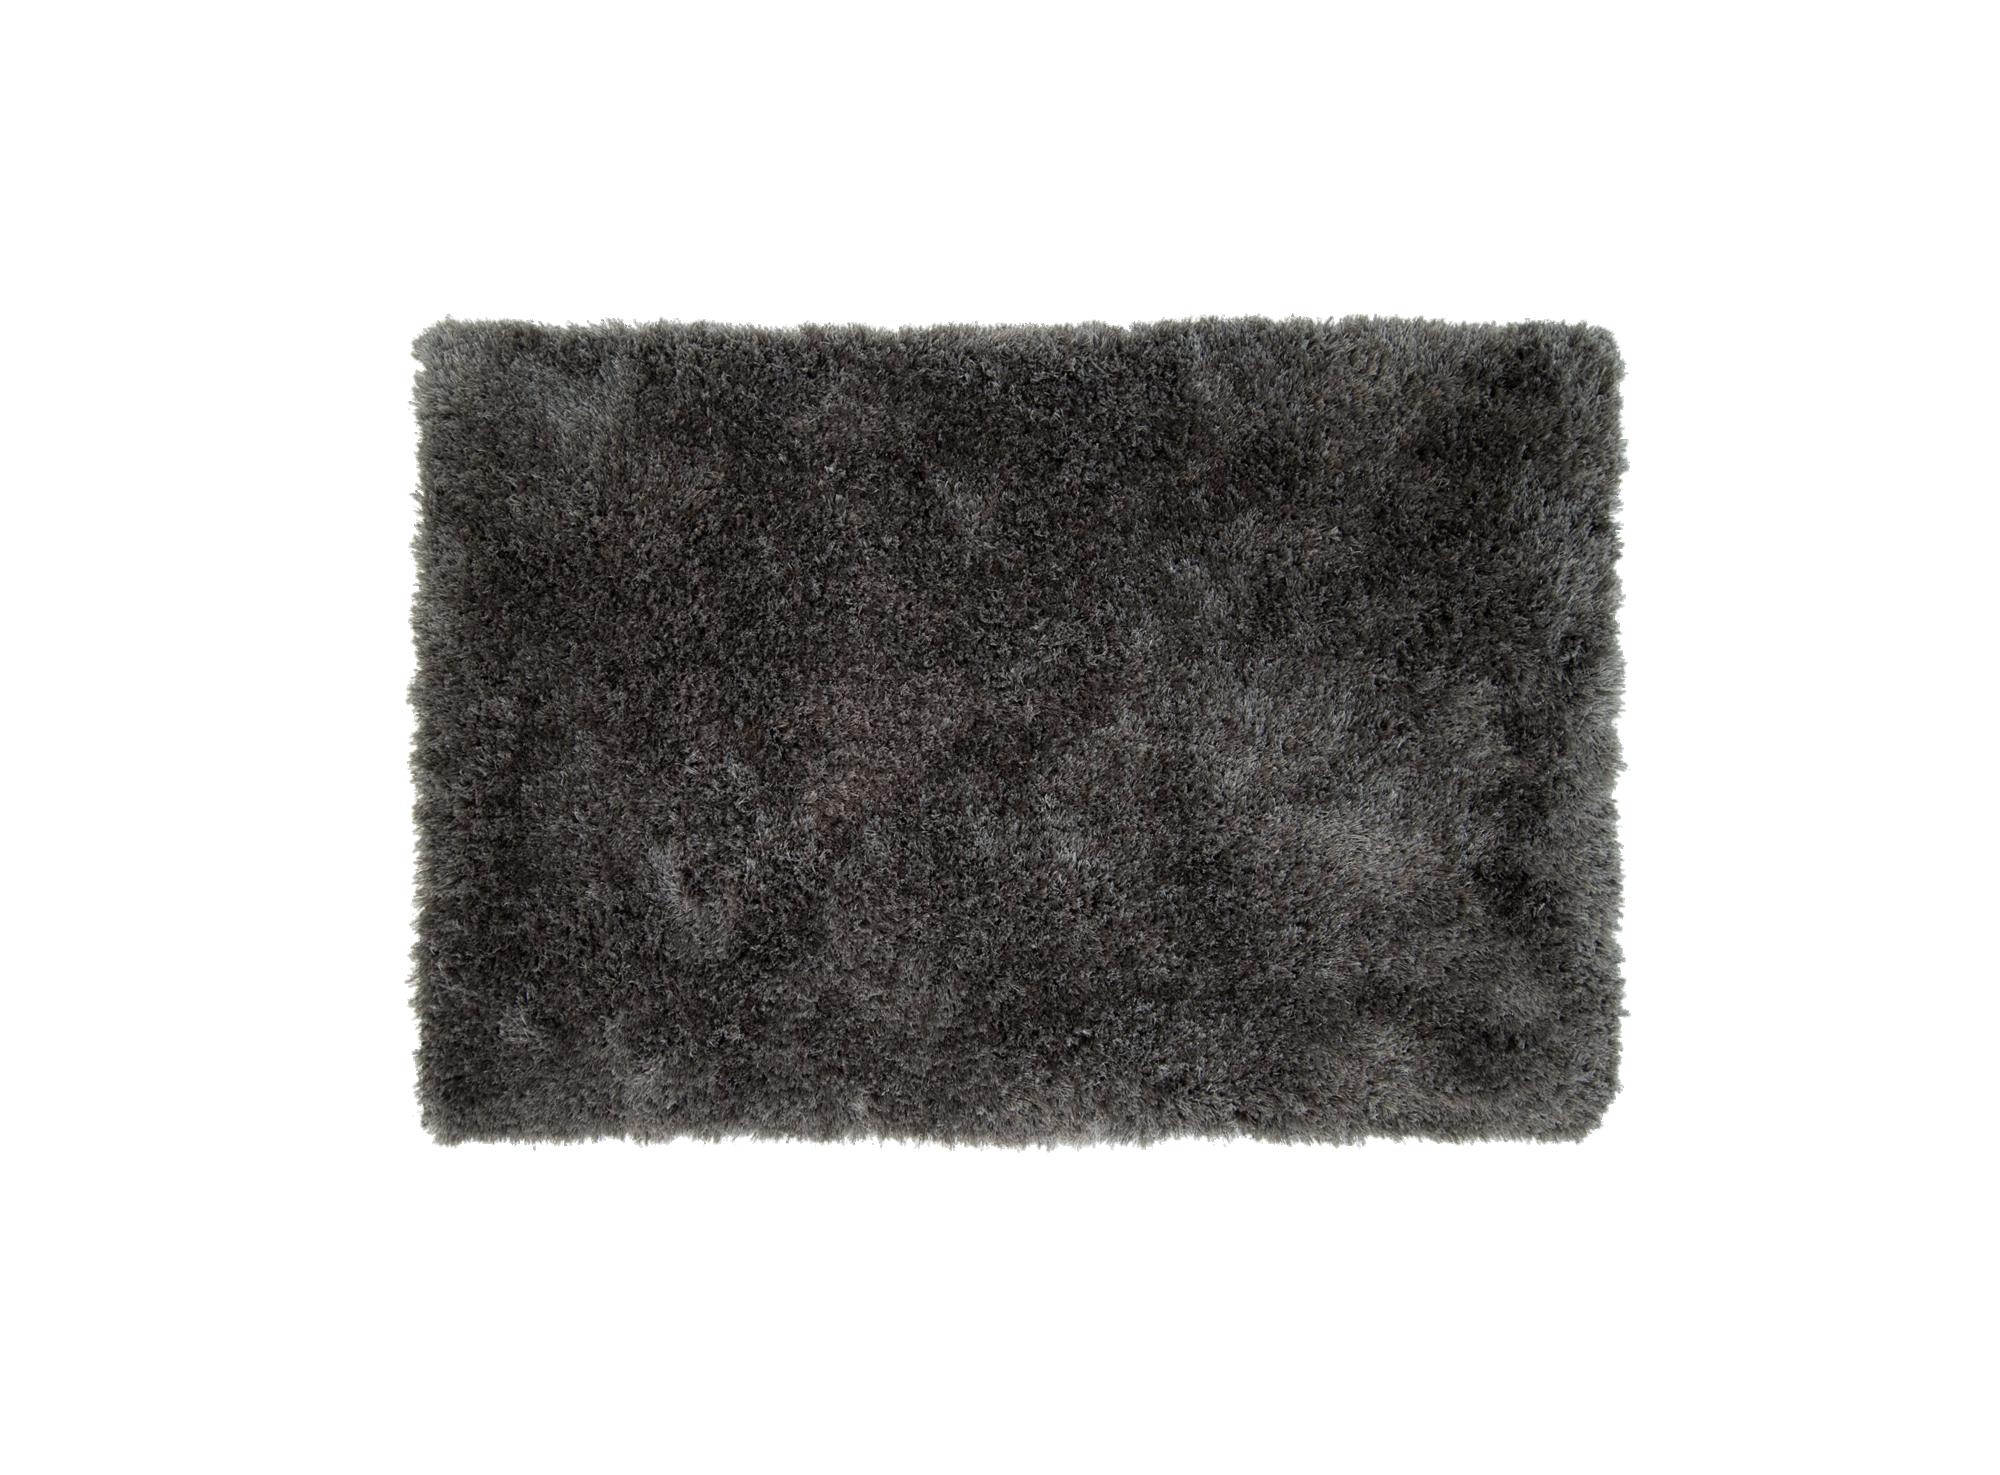 Tapis 120x170 100% polyester dos 100% coton coloris anthracite densi ...